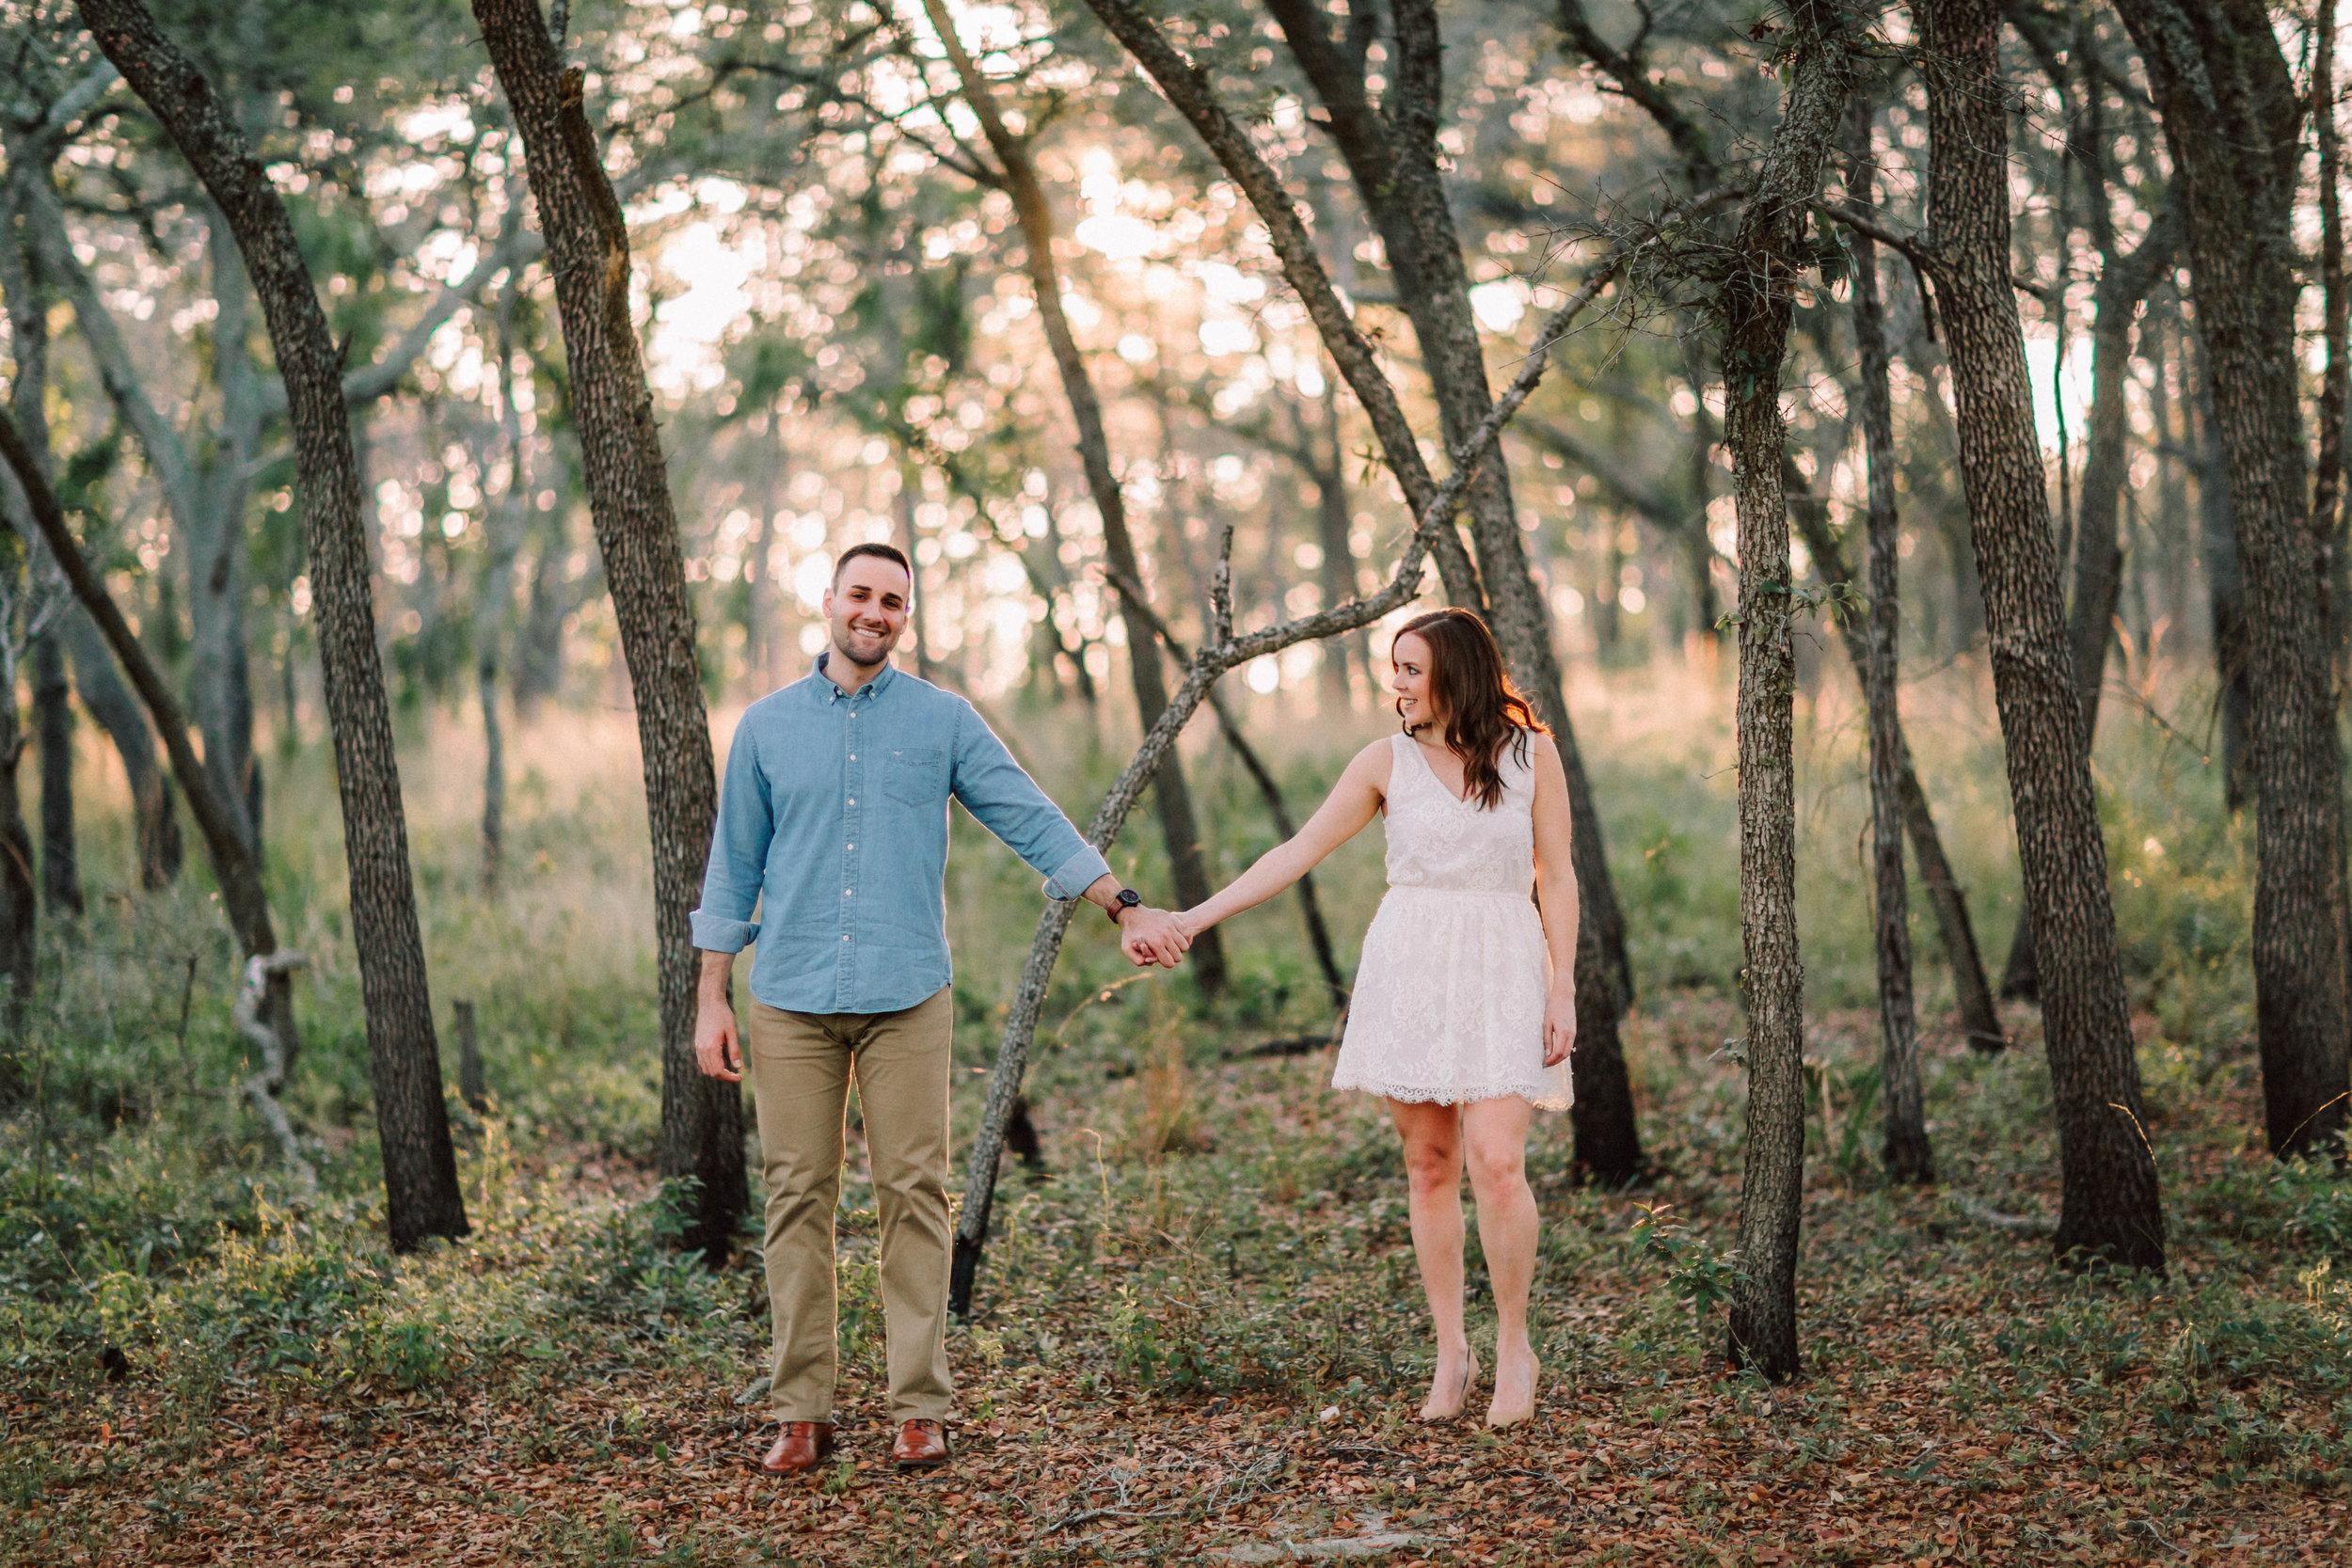 Orlando Engagement session at Wekiva Springs State Park nature-Anthony + Christine 24.jpg